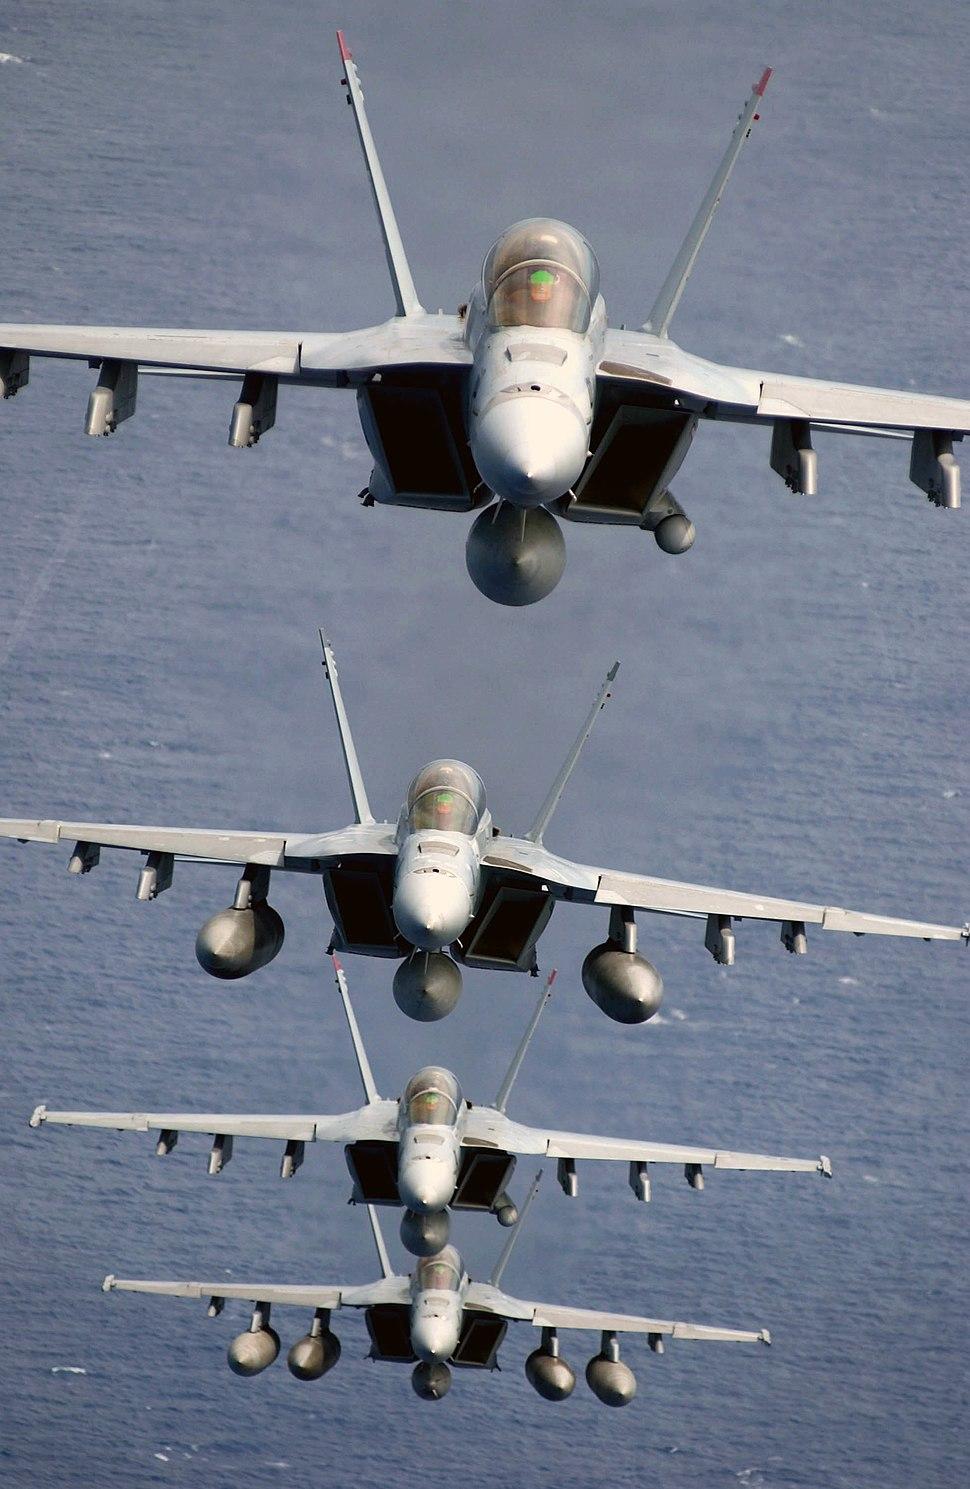 Four Super Hornets